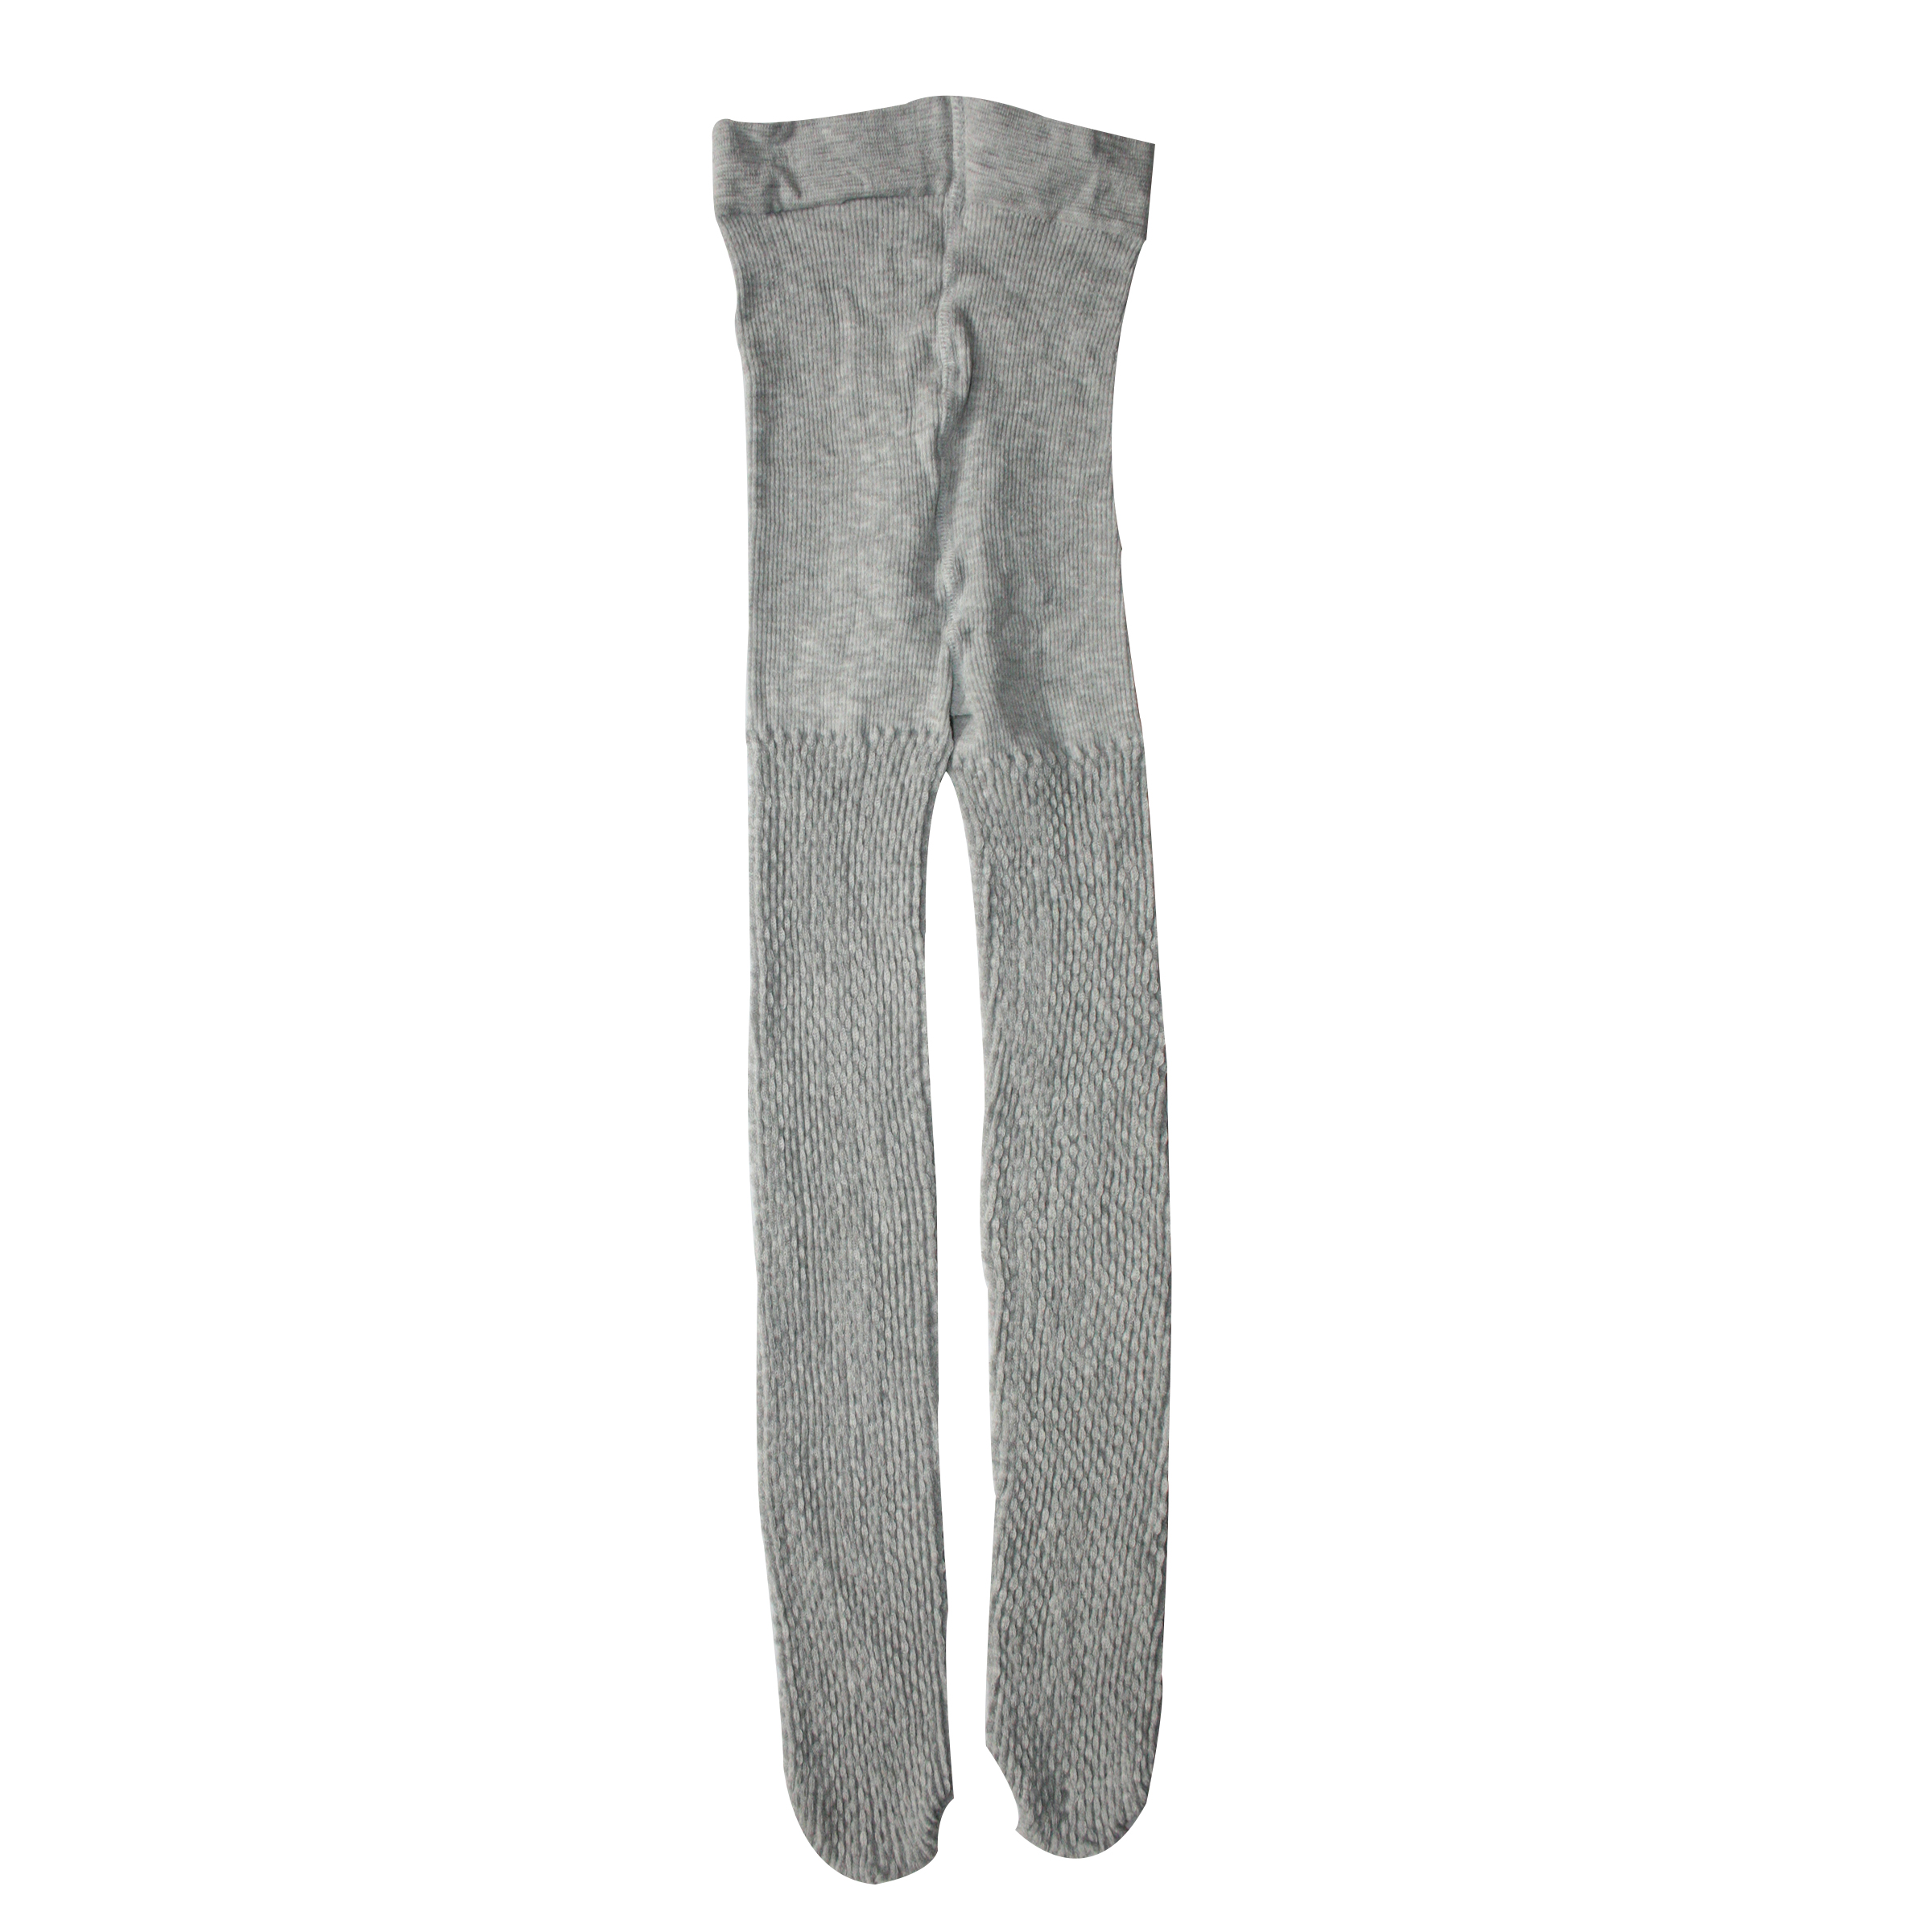 جوراب شلواری زنانه ایوا کد 1061